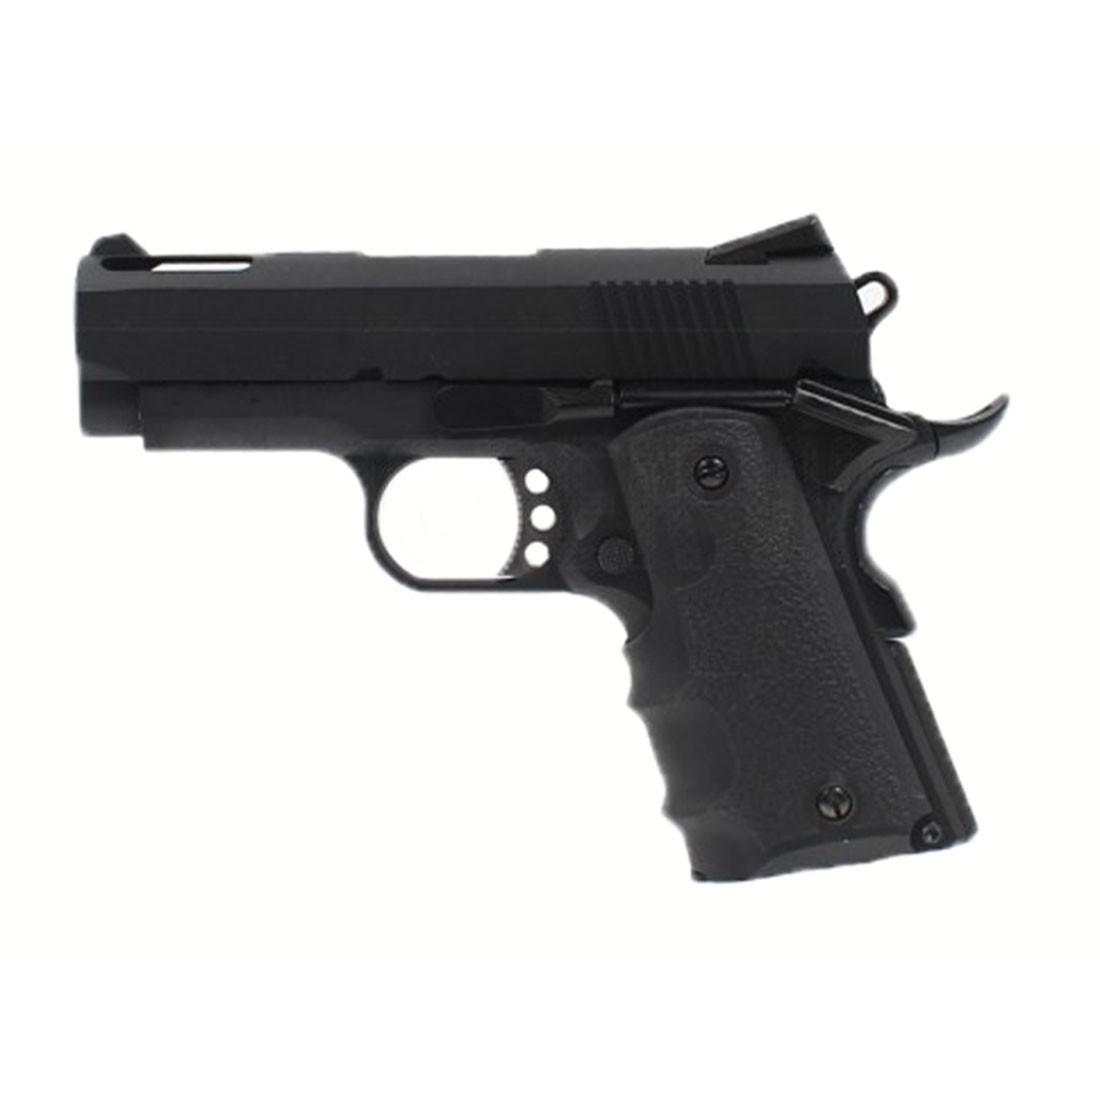 Armorer Works Custom 1911 Compact GBB Pistol -Black